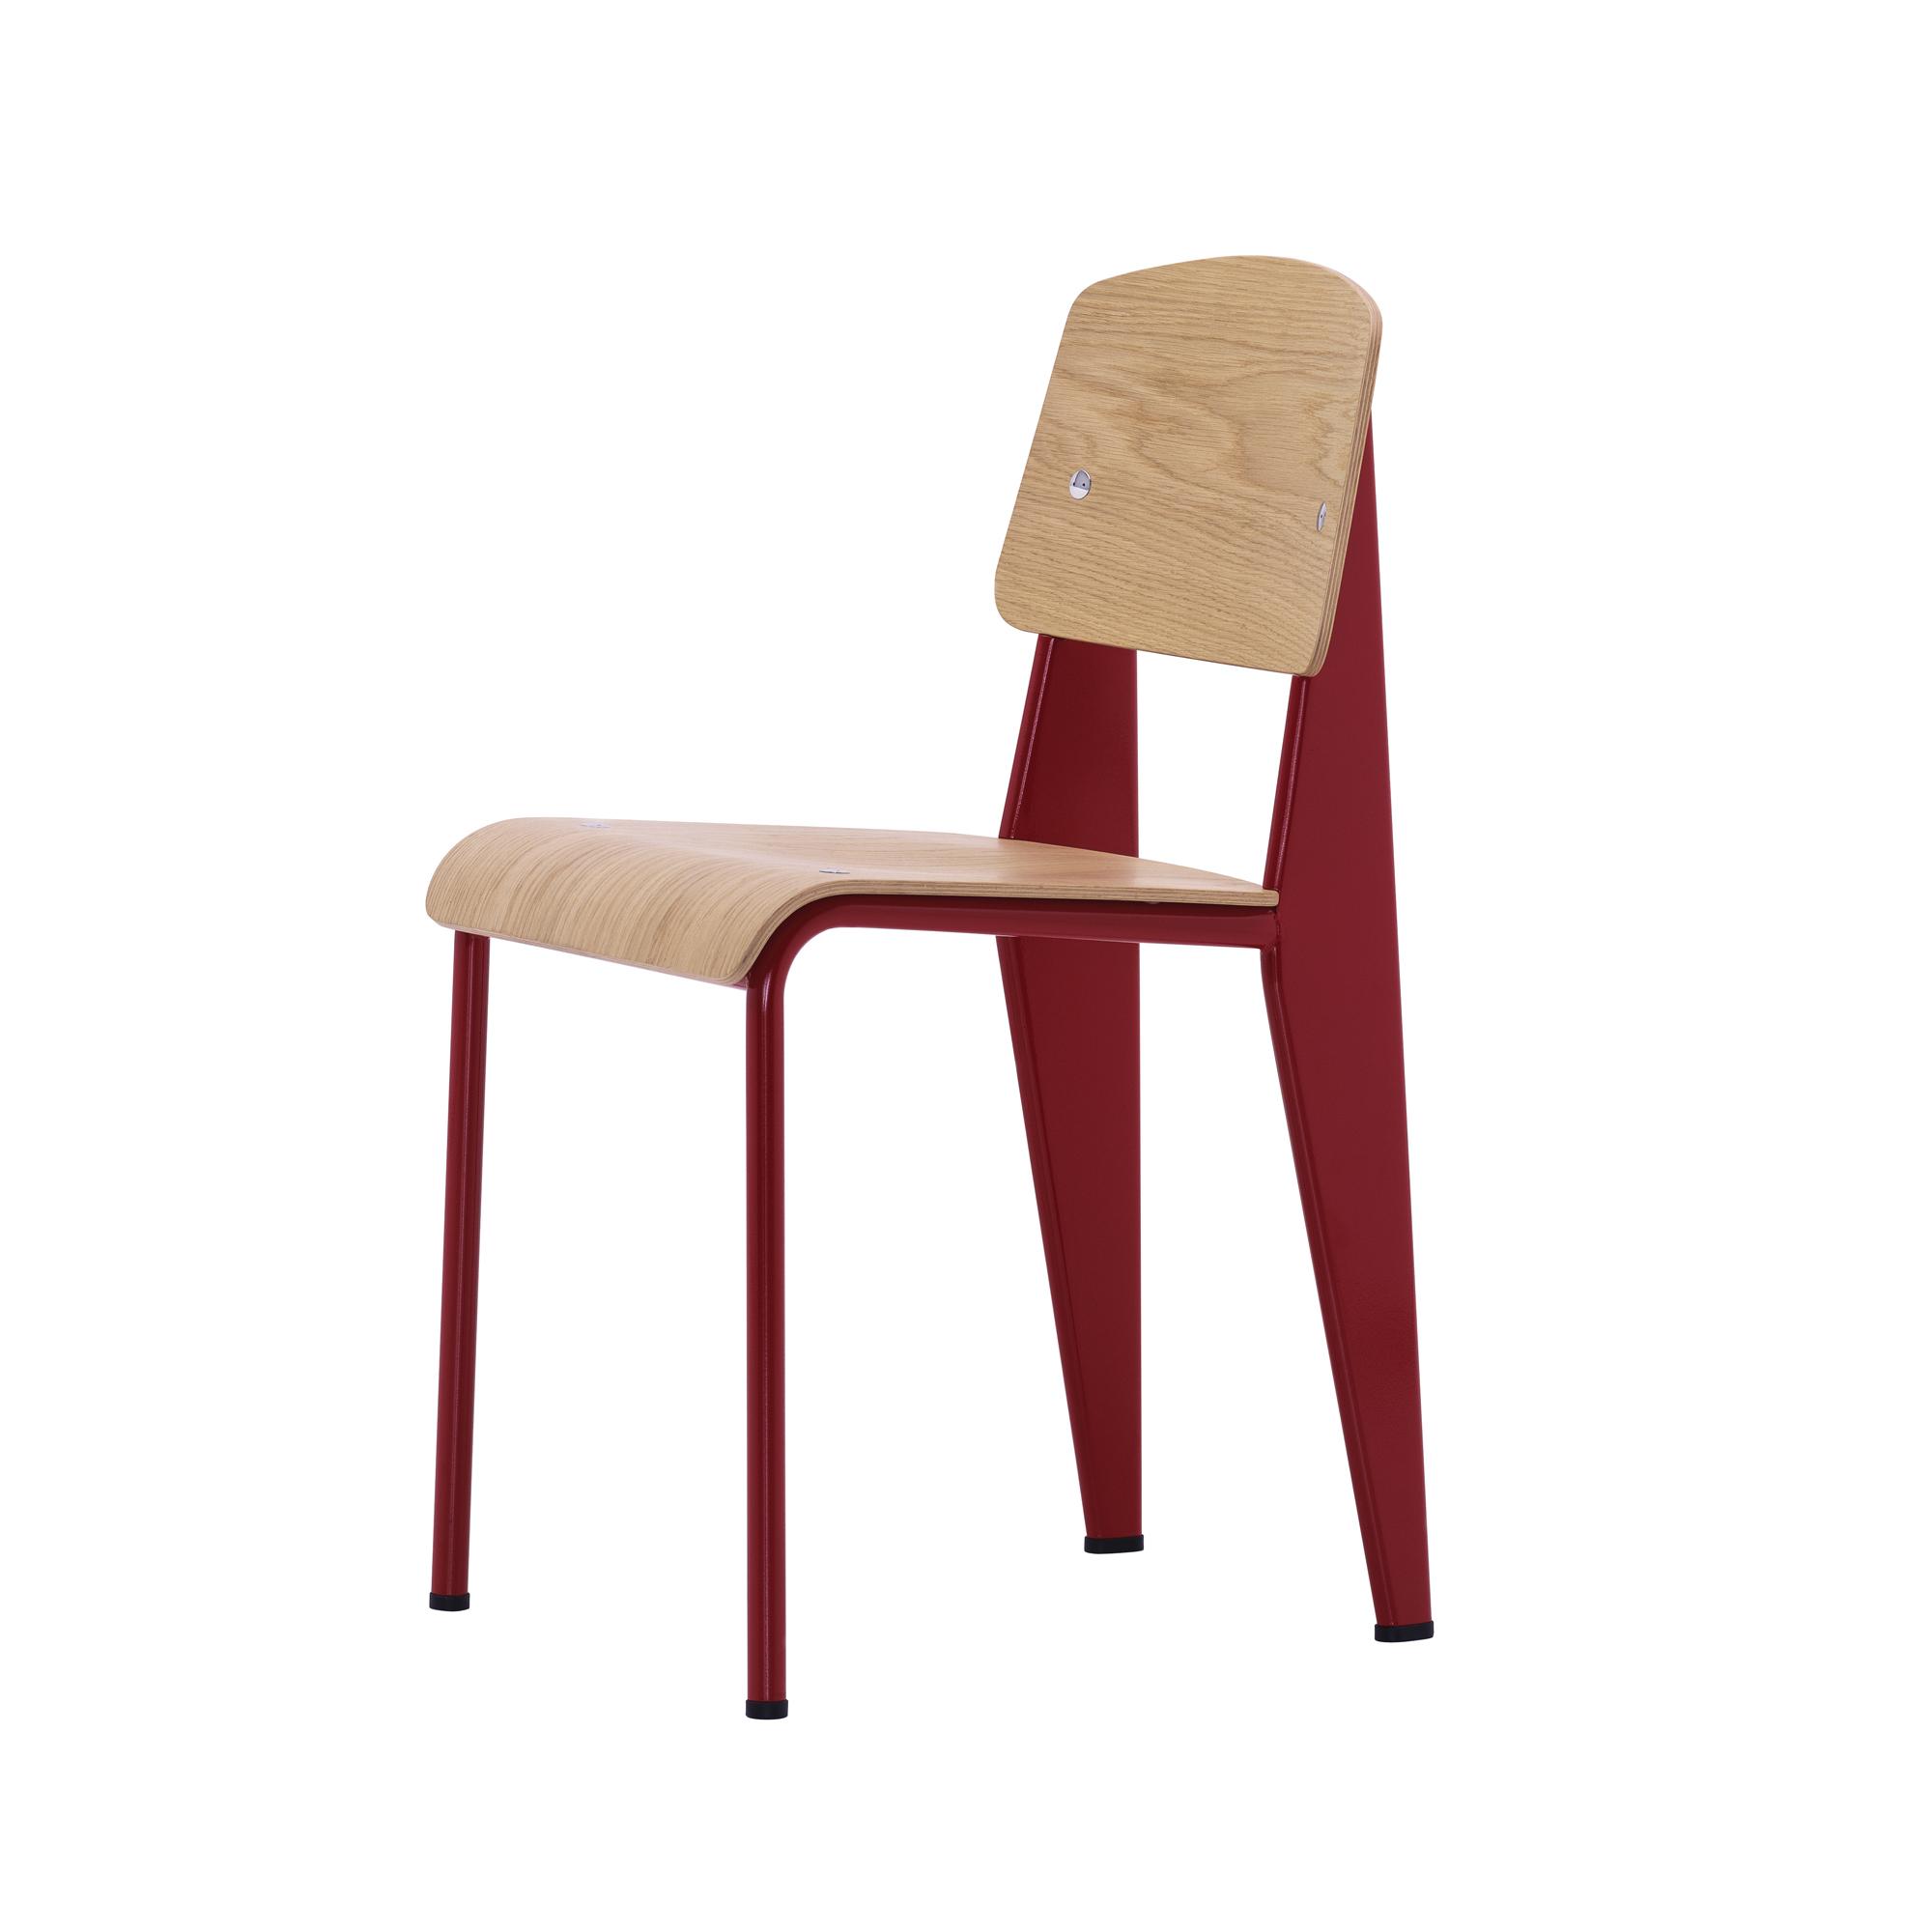 Vitra stuhl standard von jean prouv designikonen for Stuhl design buch